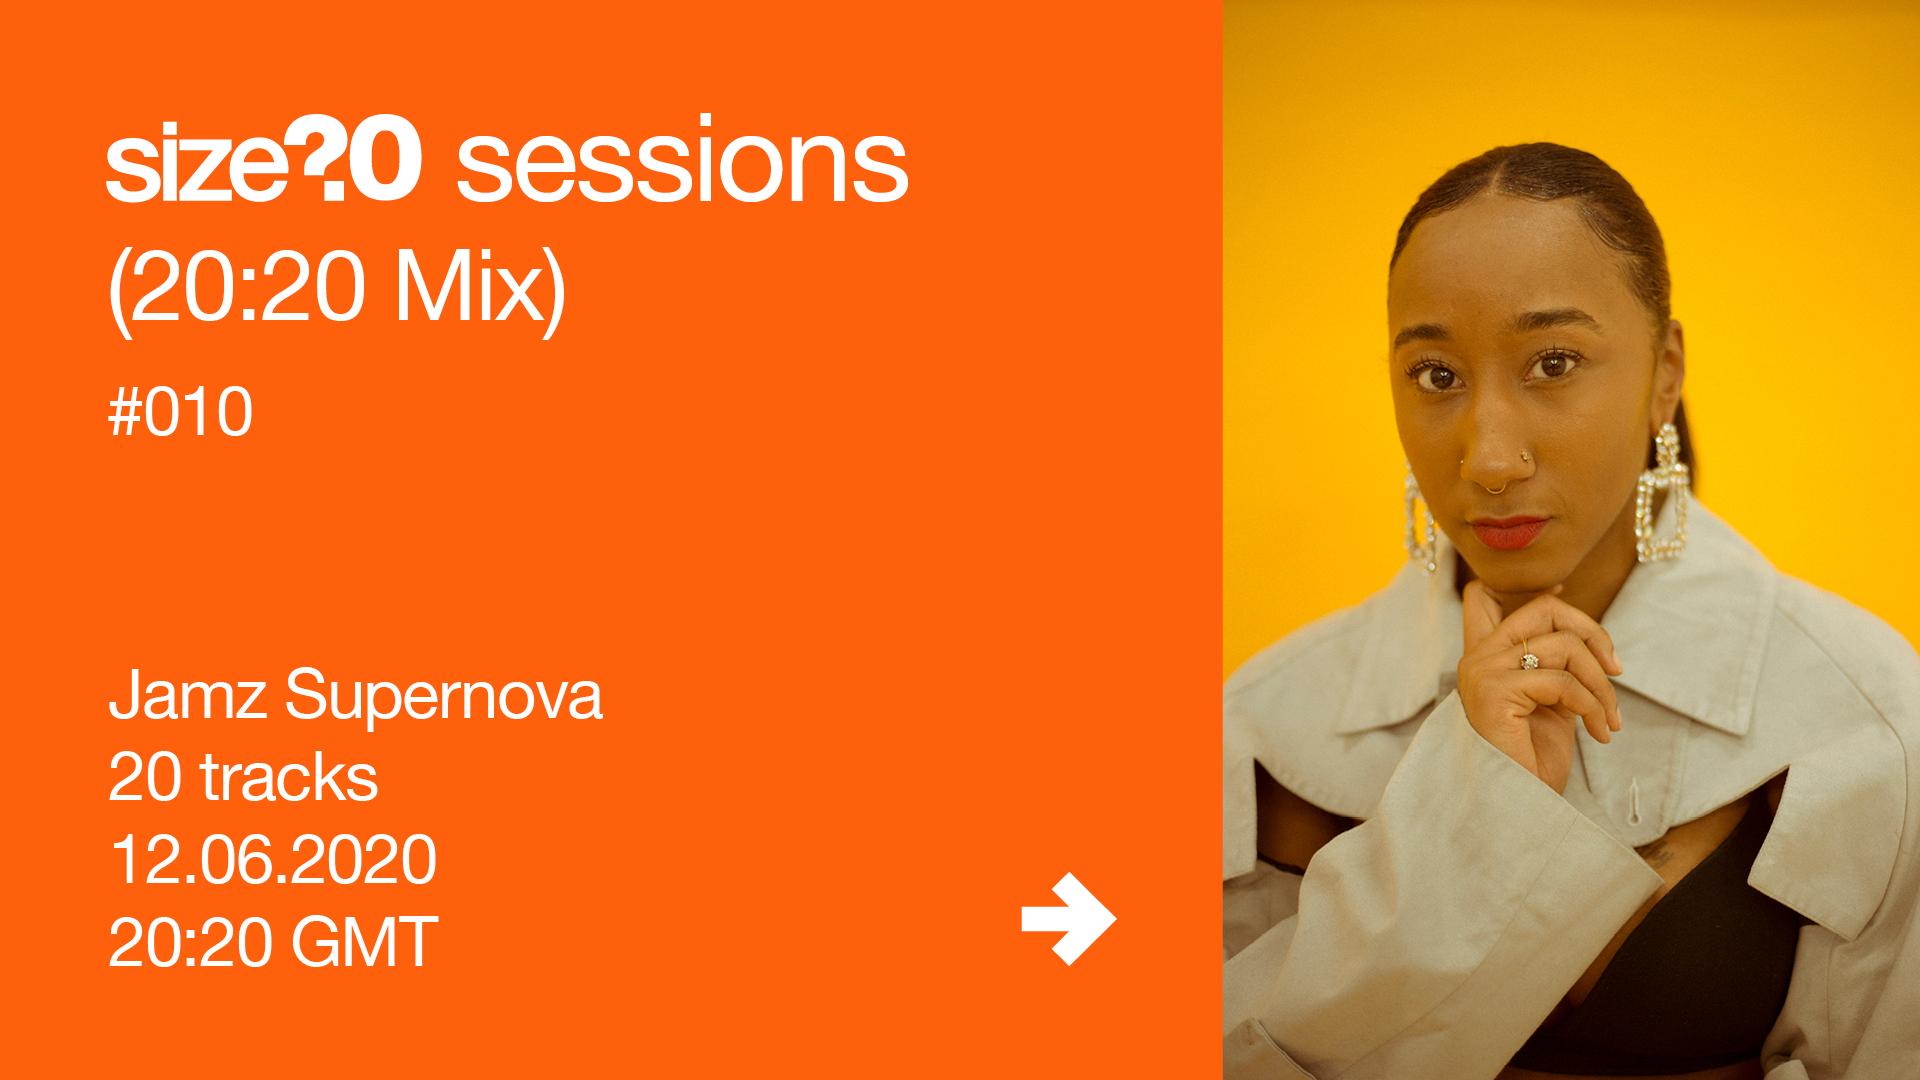 Jamz Supernova size? sessions (20:20 Mix)